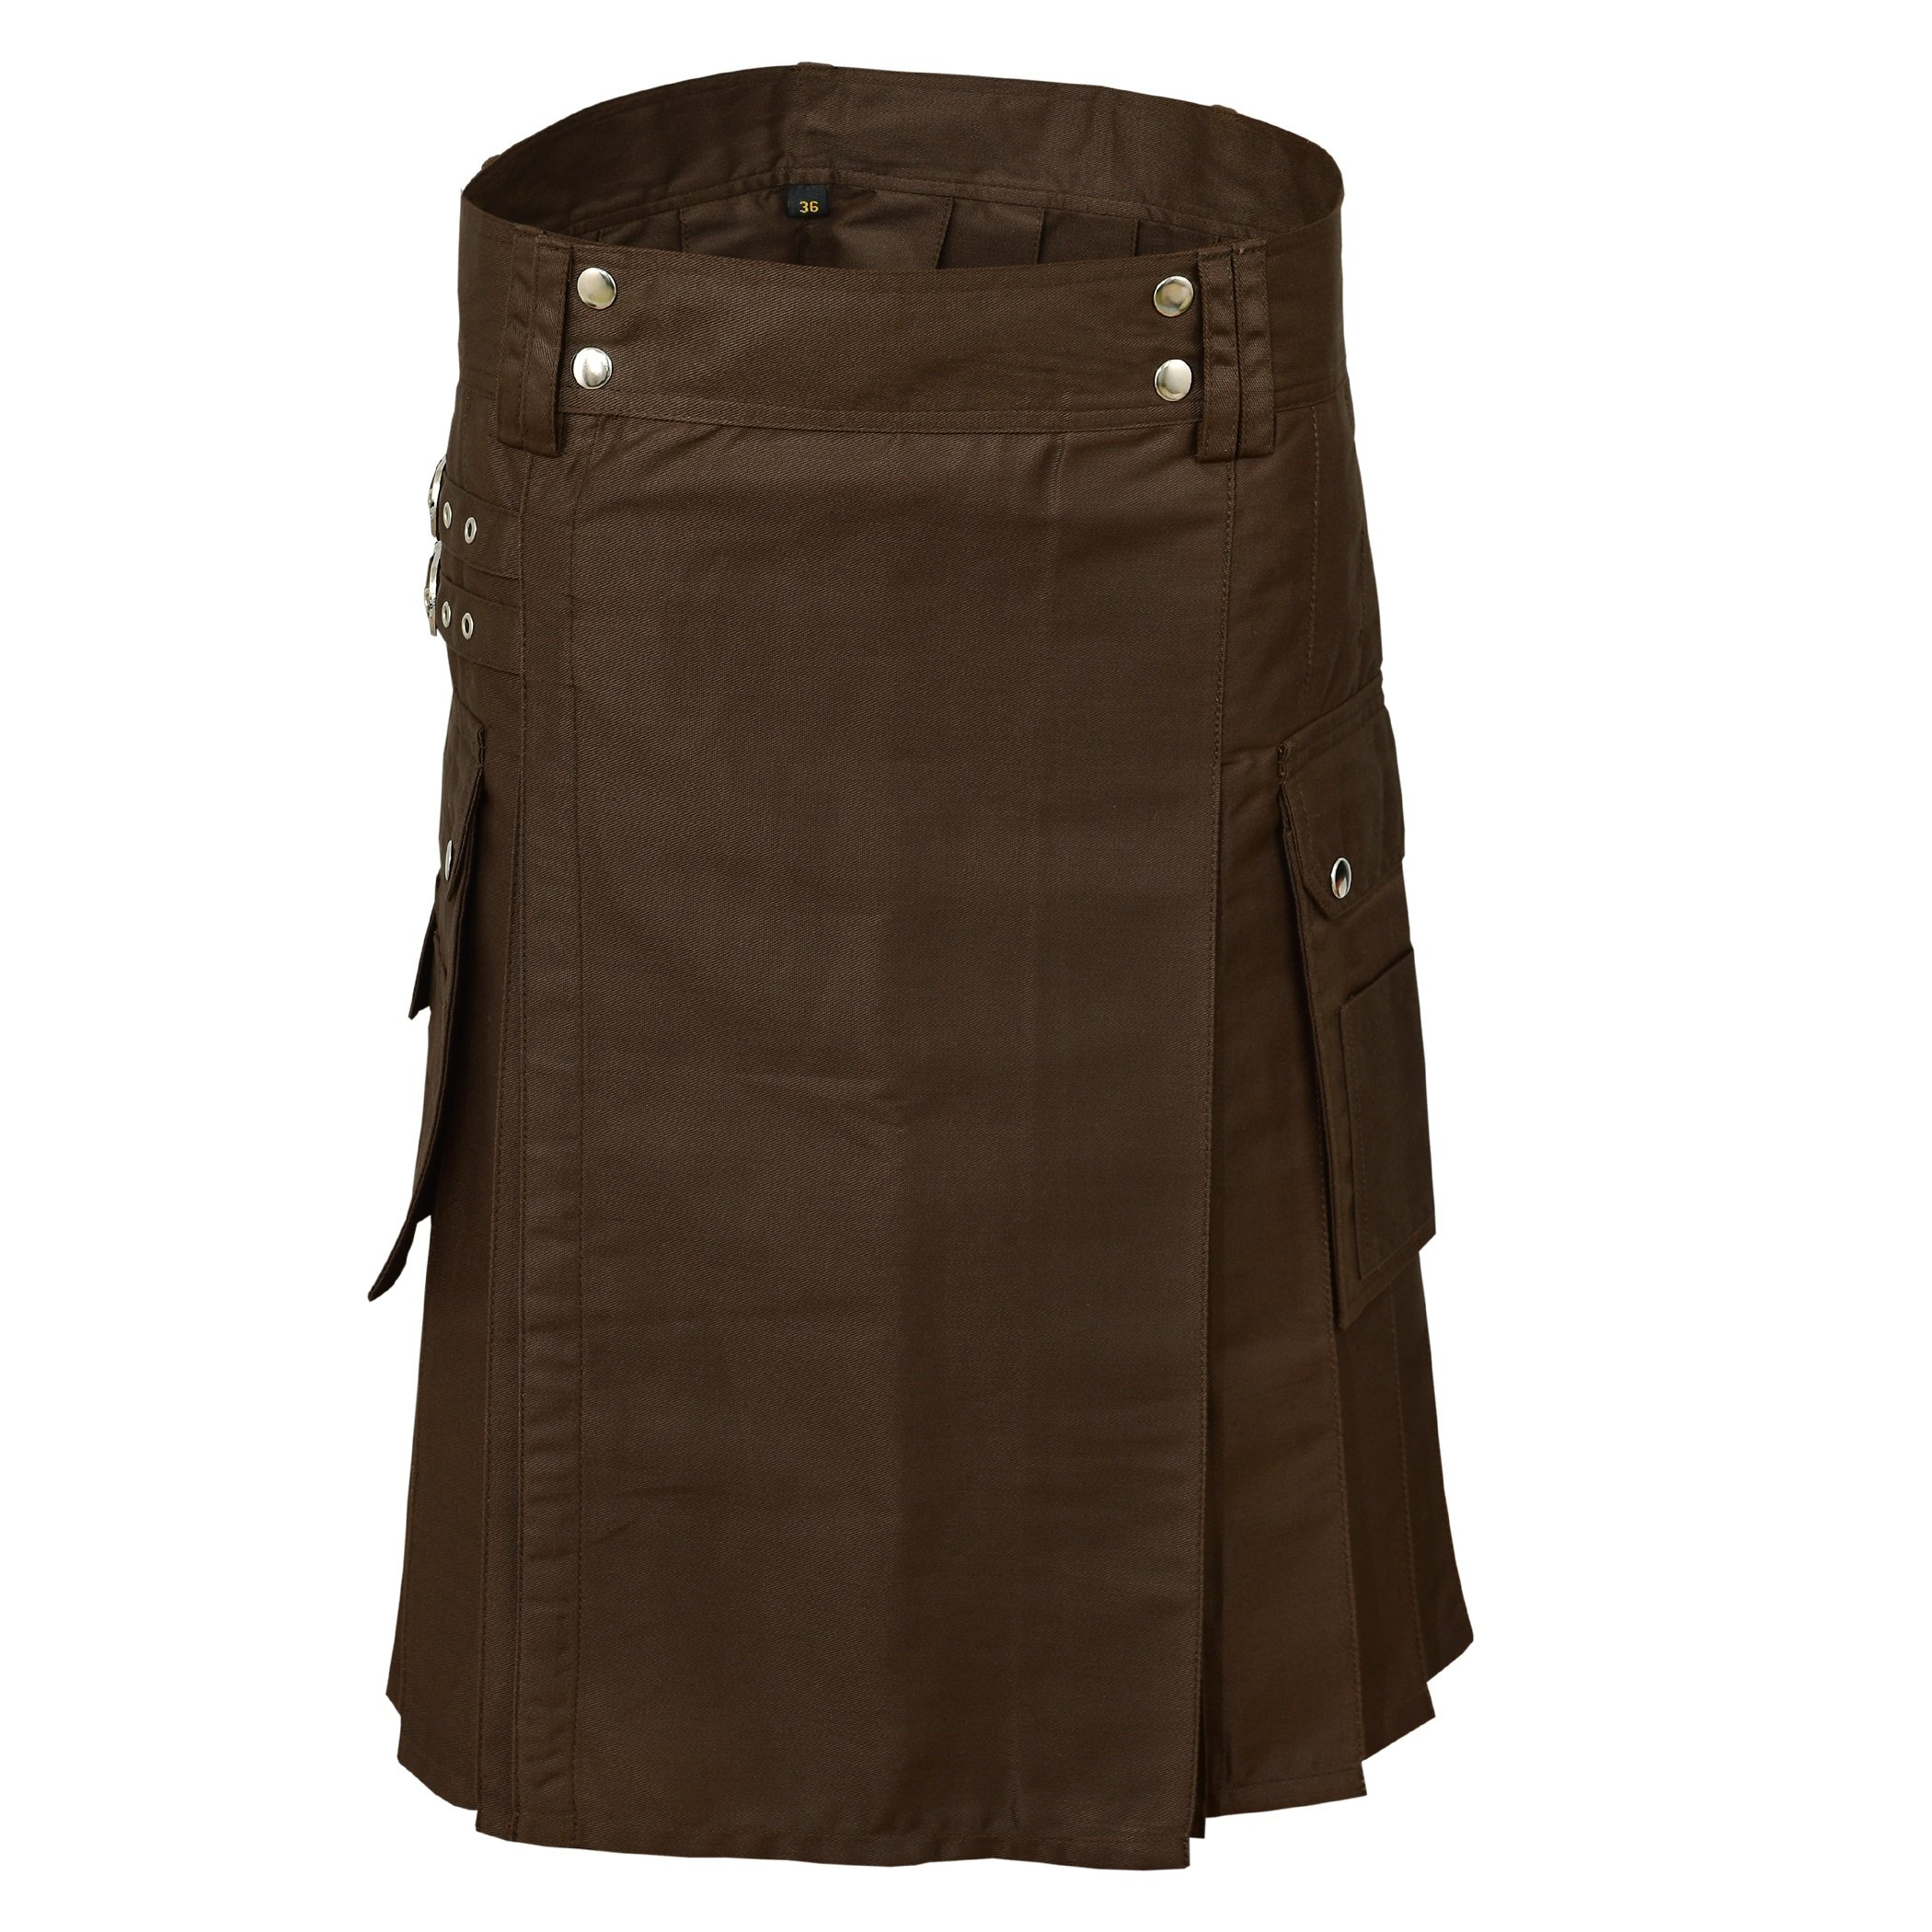 Chocolate Brown Men Leather Straps Fashion Sport Utility Kilt Deluxe Kilt Adjustable Sizes (40'')